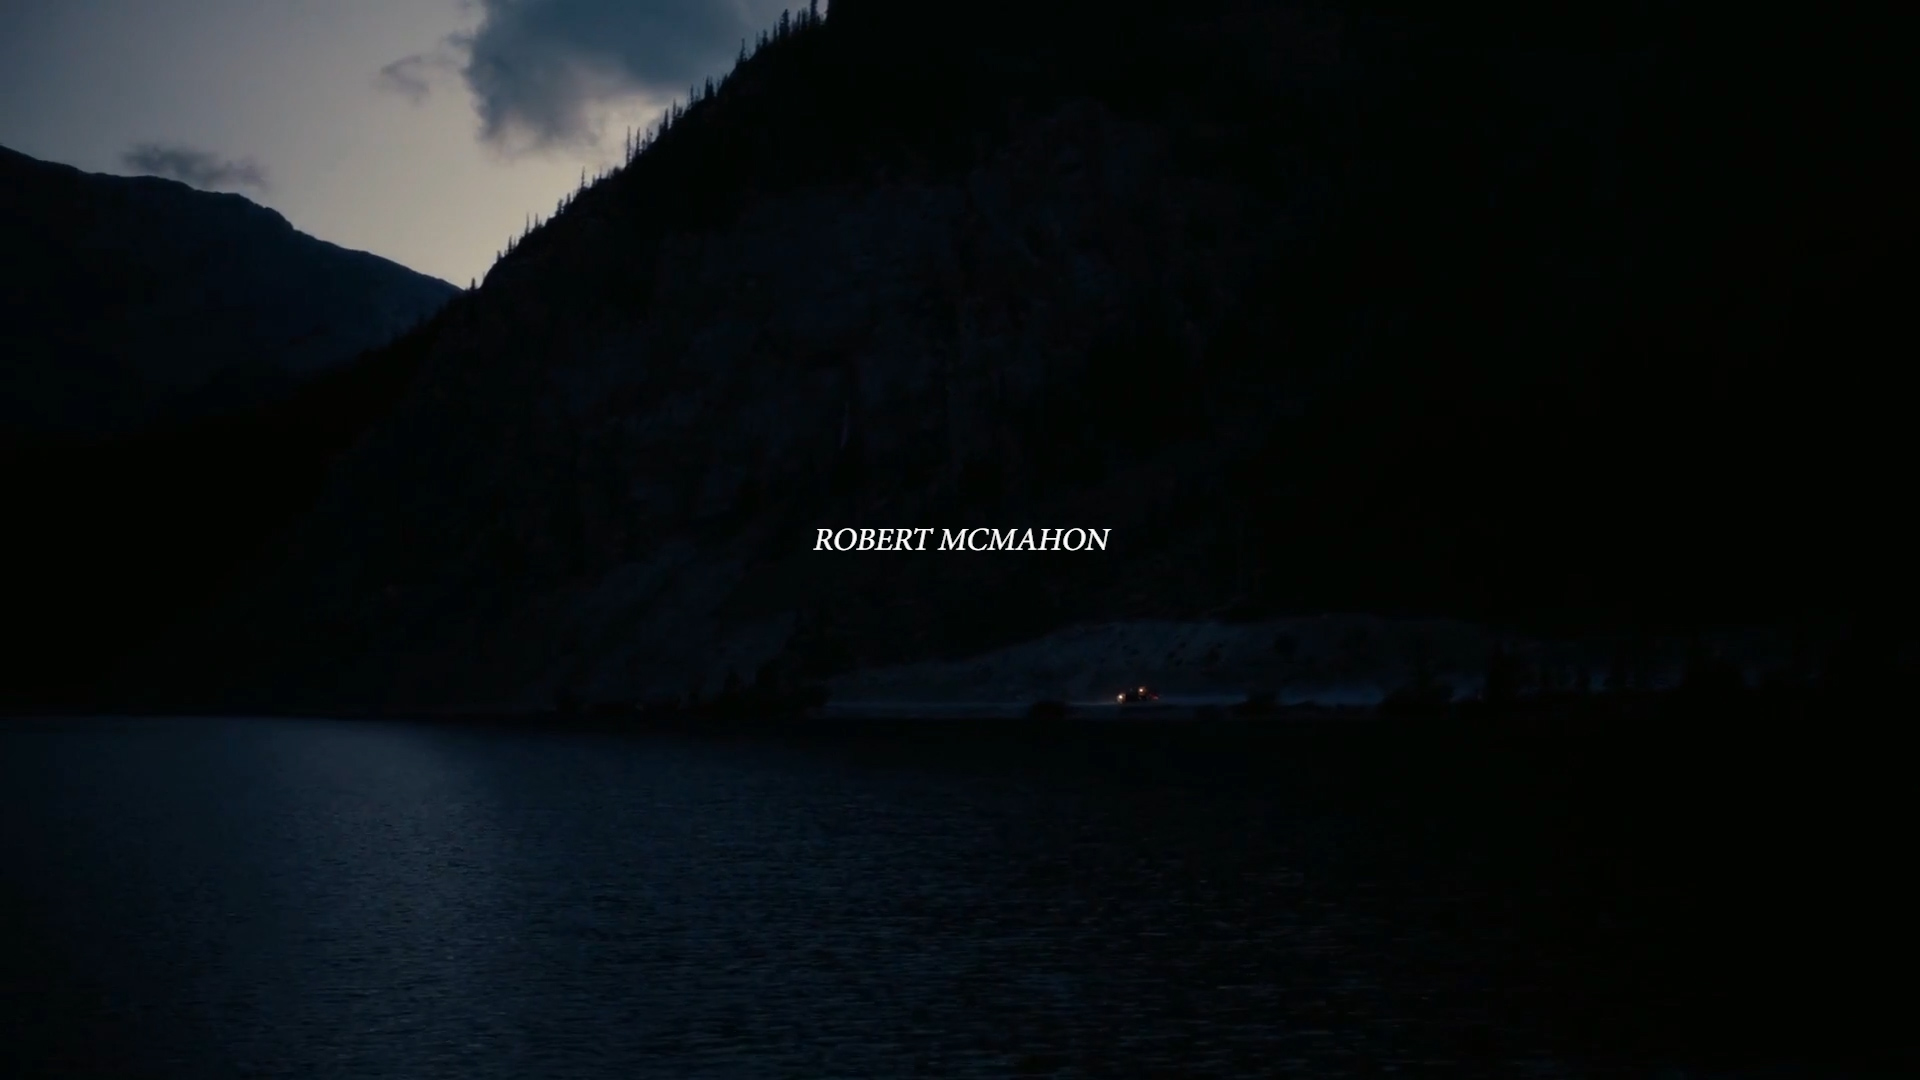 ROBERT MCMAHON - Favorite Film Shots